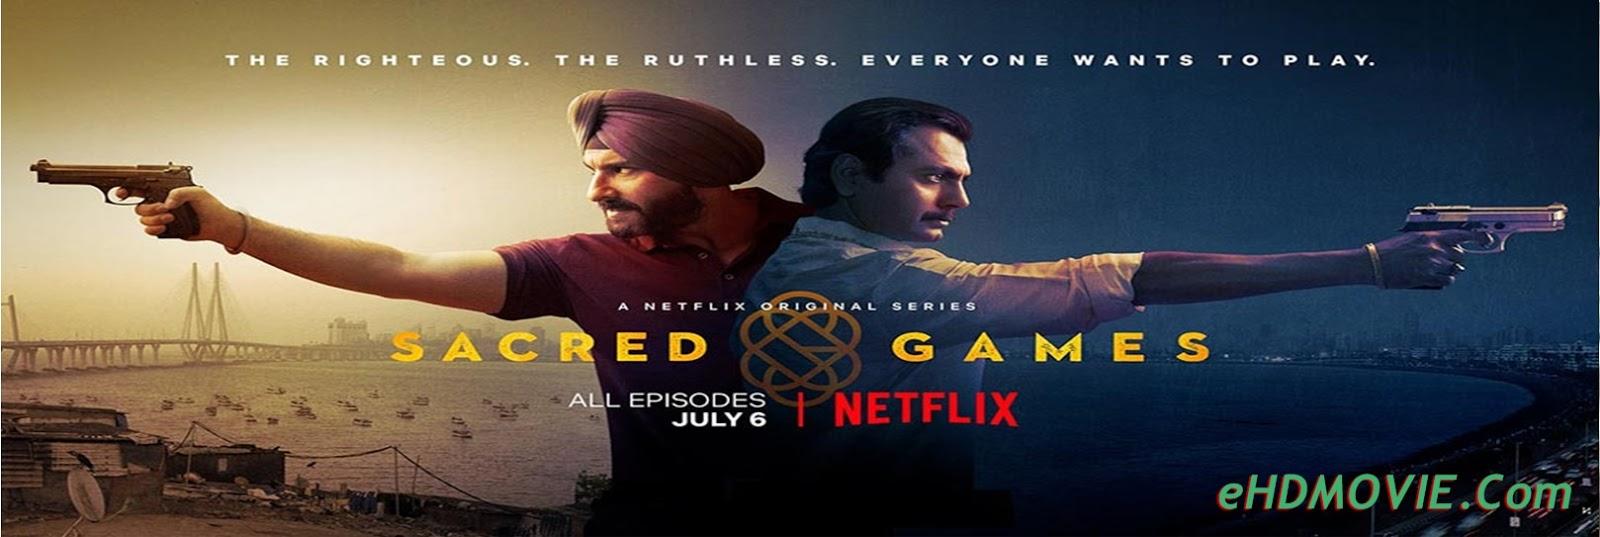 Sacred Games S01 Complete Dual Audio 720p HDRip [Hindi – English] ESubs